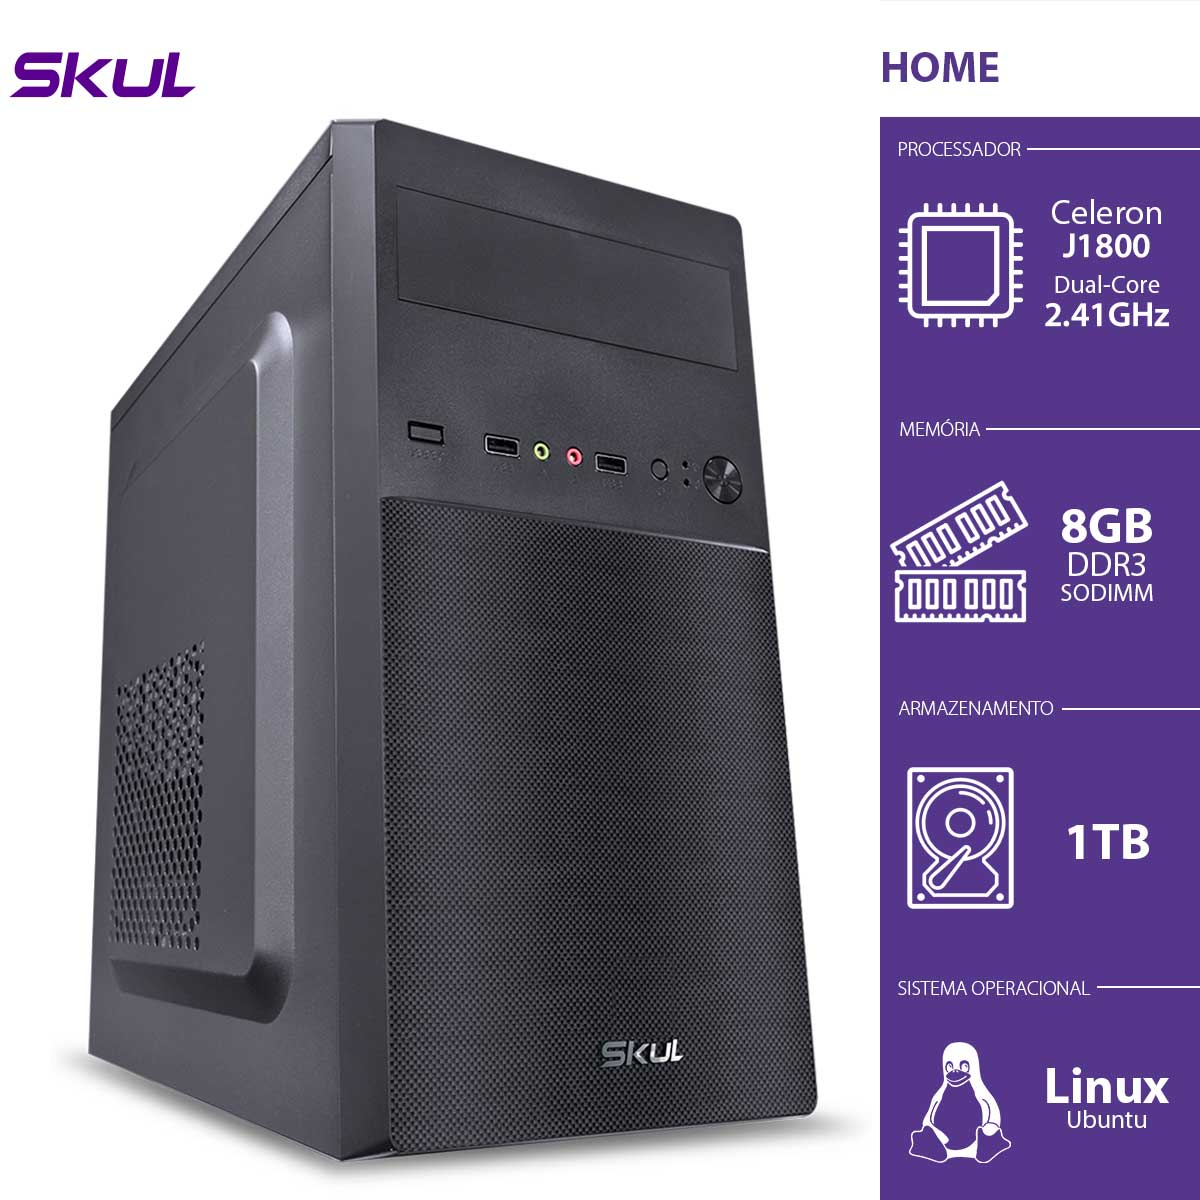 Computador Home H100 - Celeron Dual Core J1800 2.41GHZ 8GB DDR3 Sodimm HD 1TB HDMI/VGA Fonte 200W